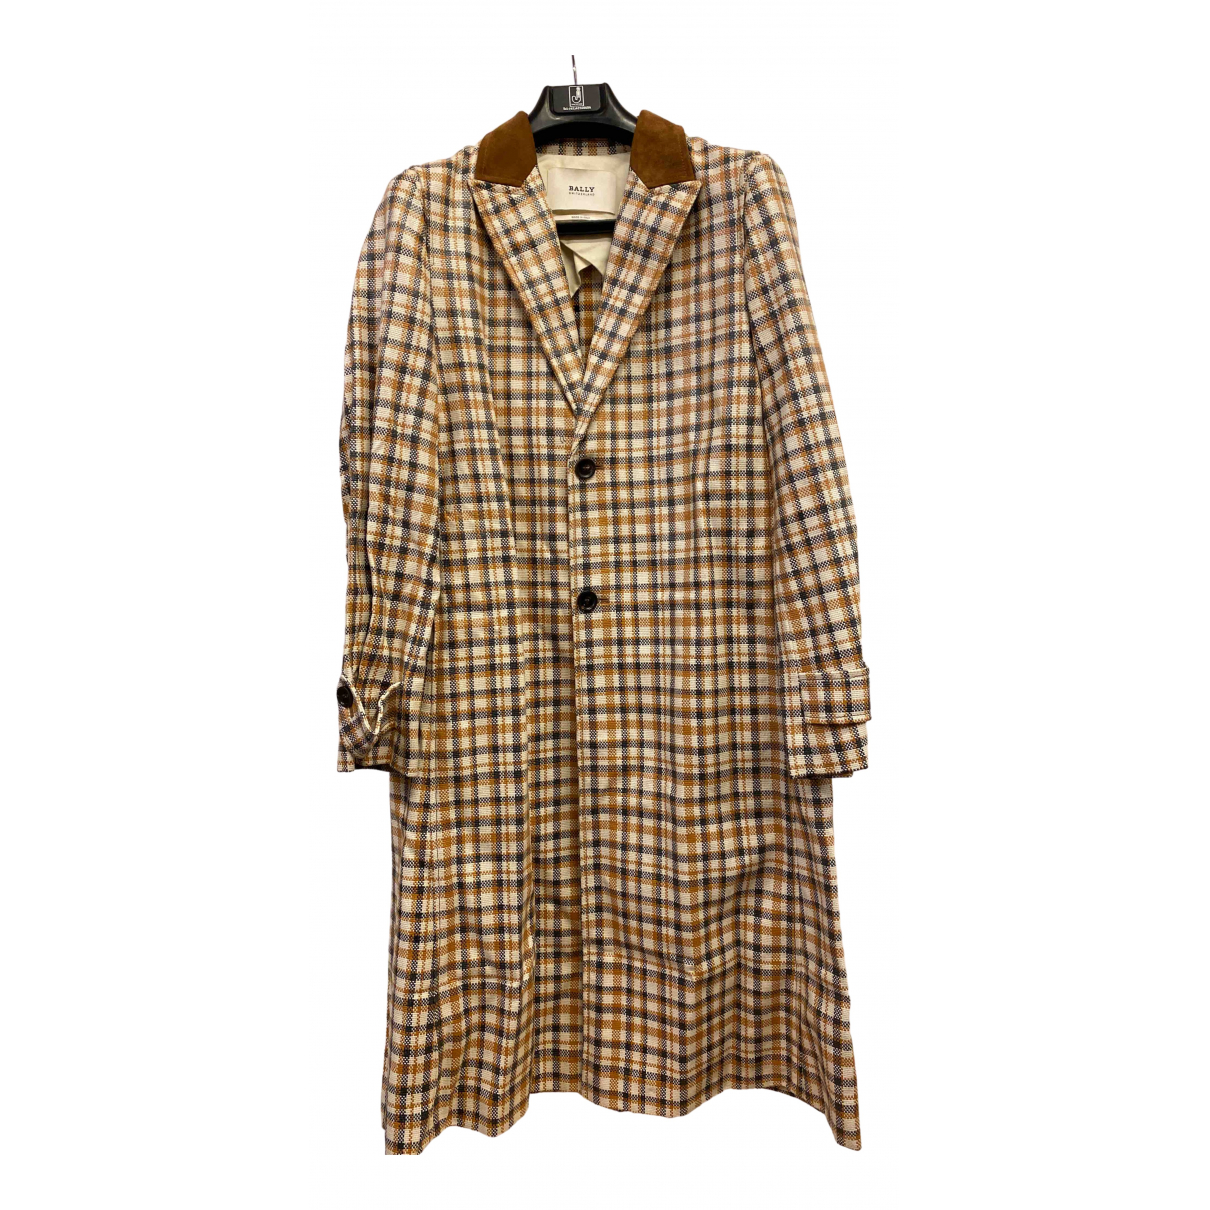 Bally - Manteau   pour homme - marron